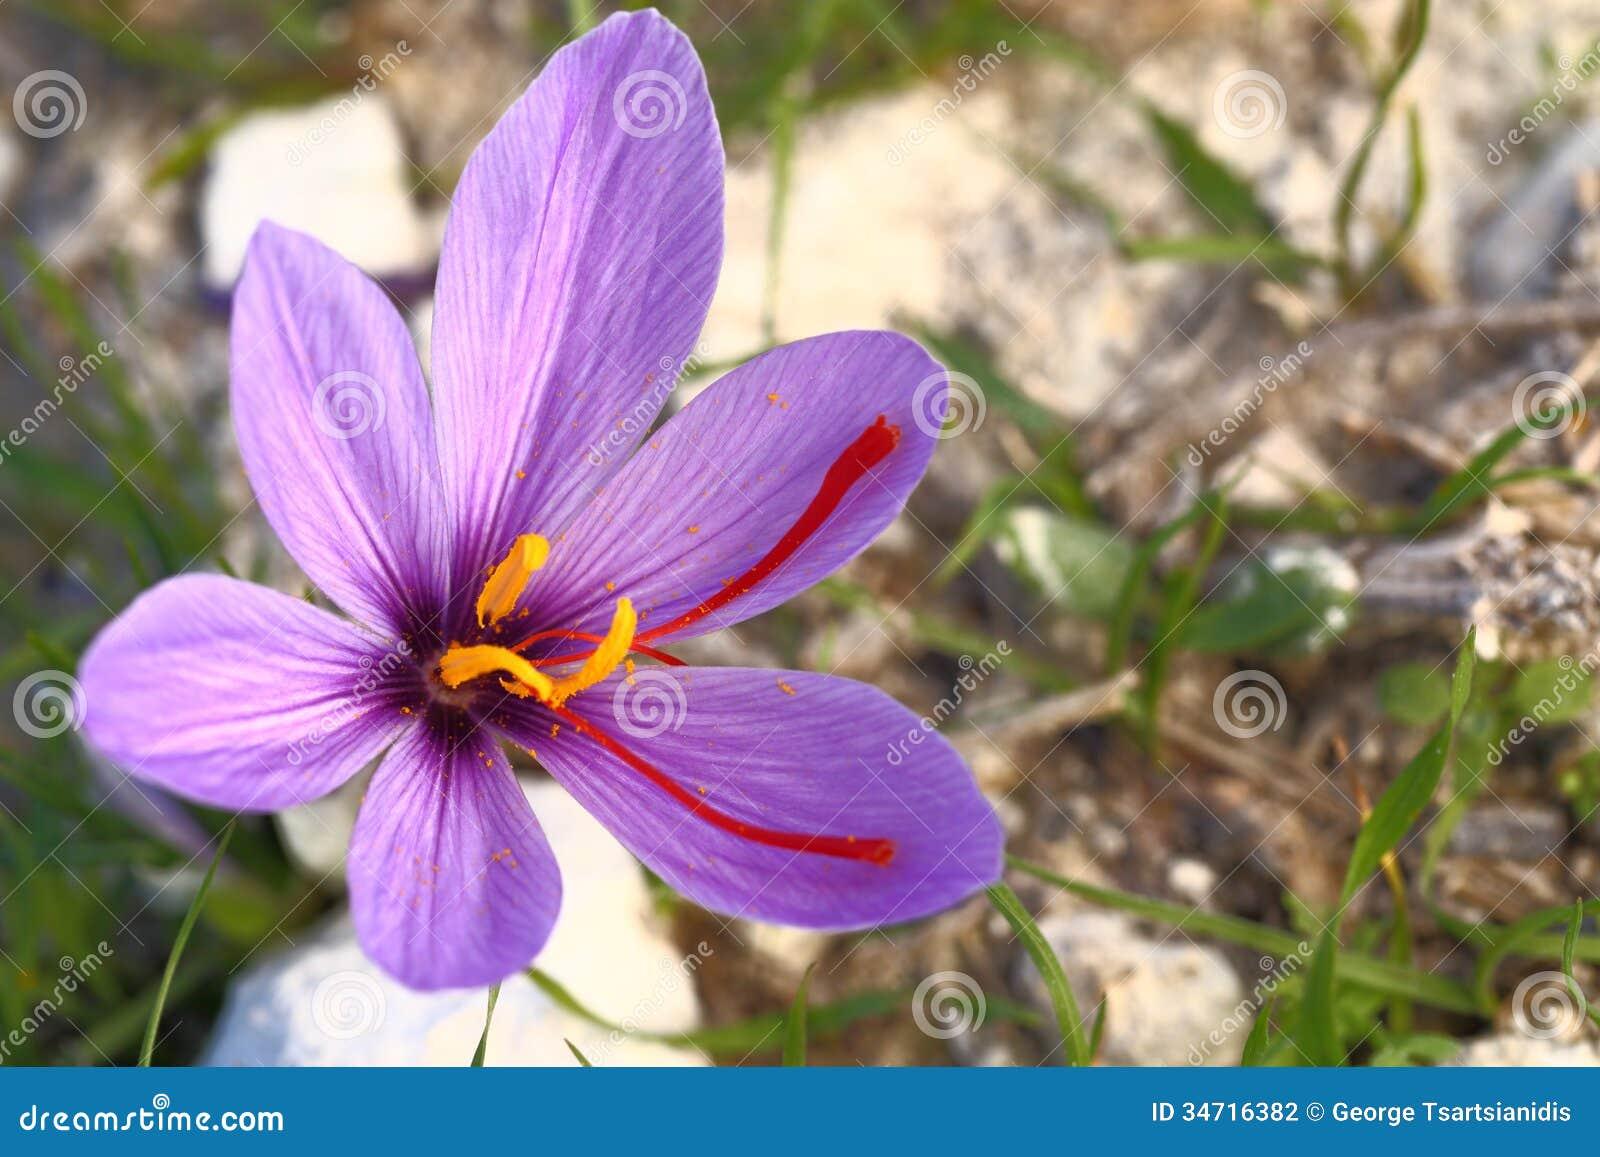 Beautiful Saffron Flowers Stock graphy Image